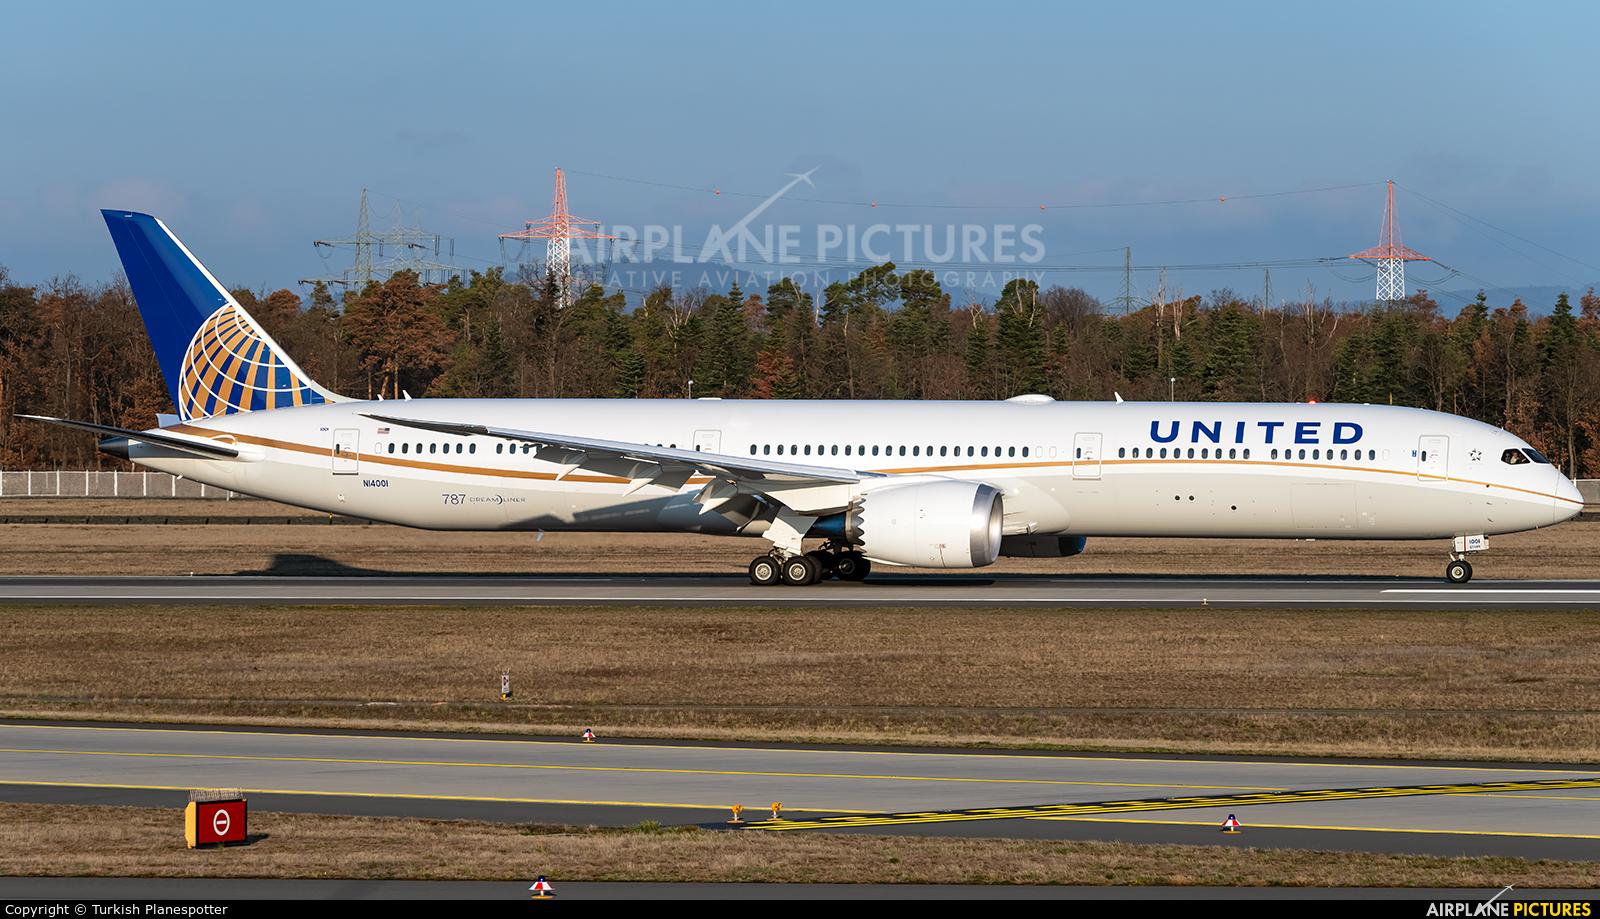 United Airlines N14001 aircraft at Frankfurt